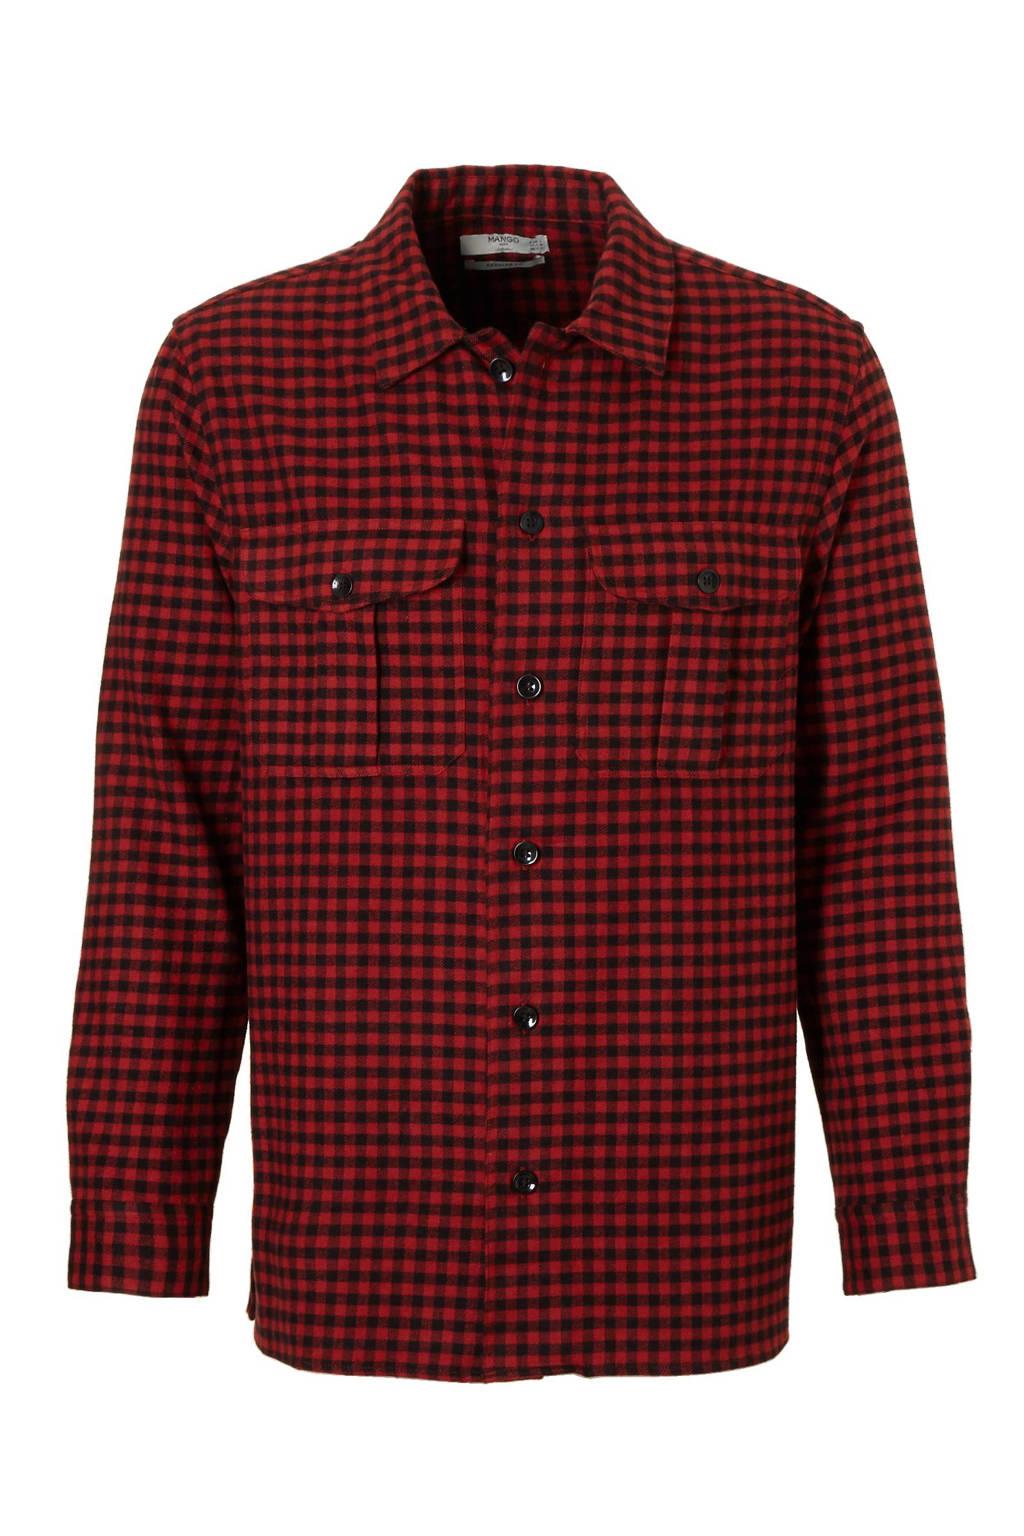 Overhemd Rood Zwart.Mango Man Flanellen Slim Fit Overhemd Wehkamp